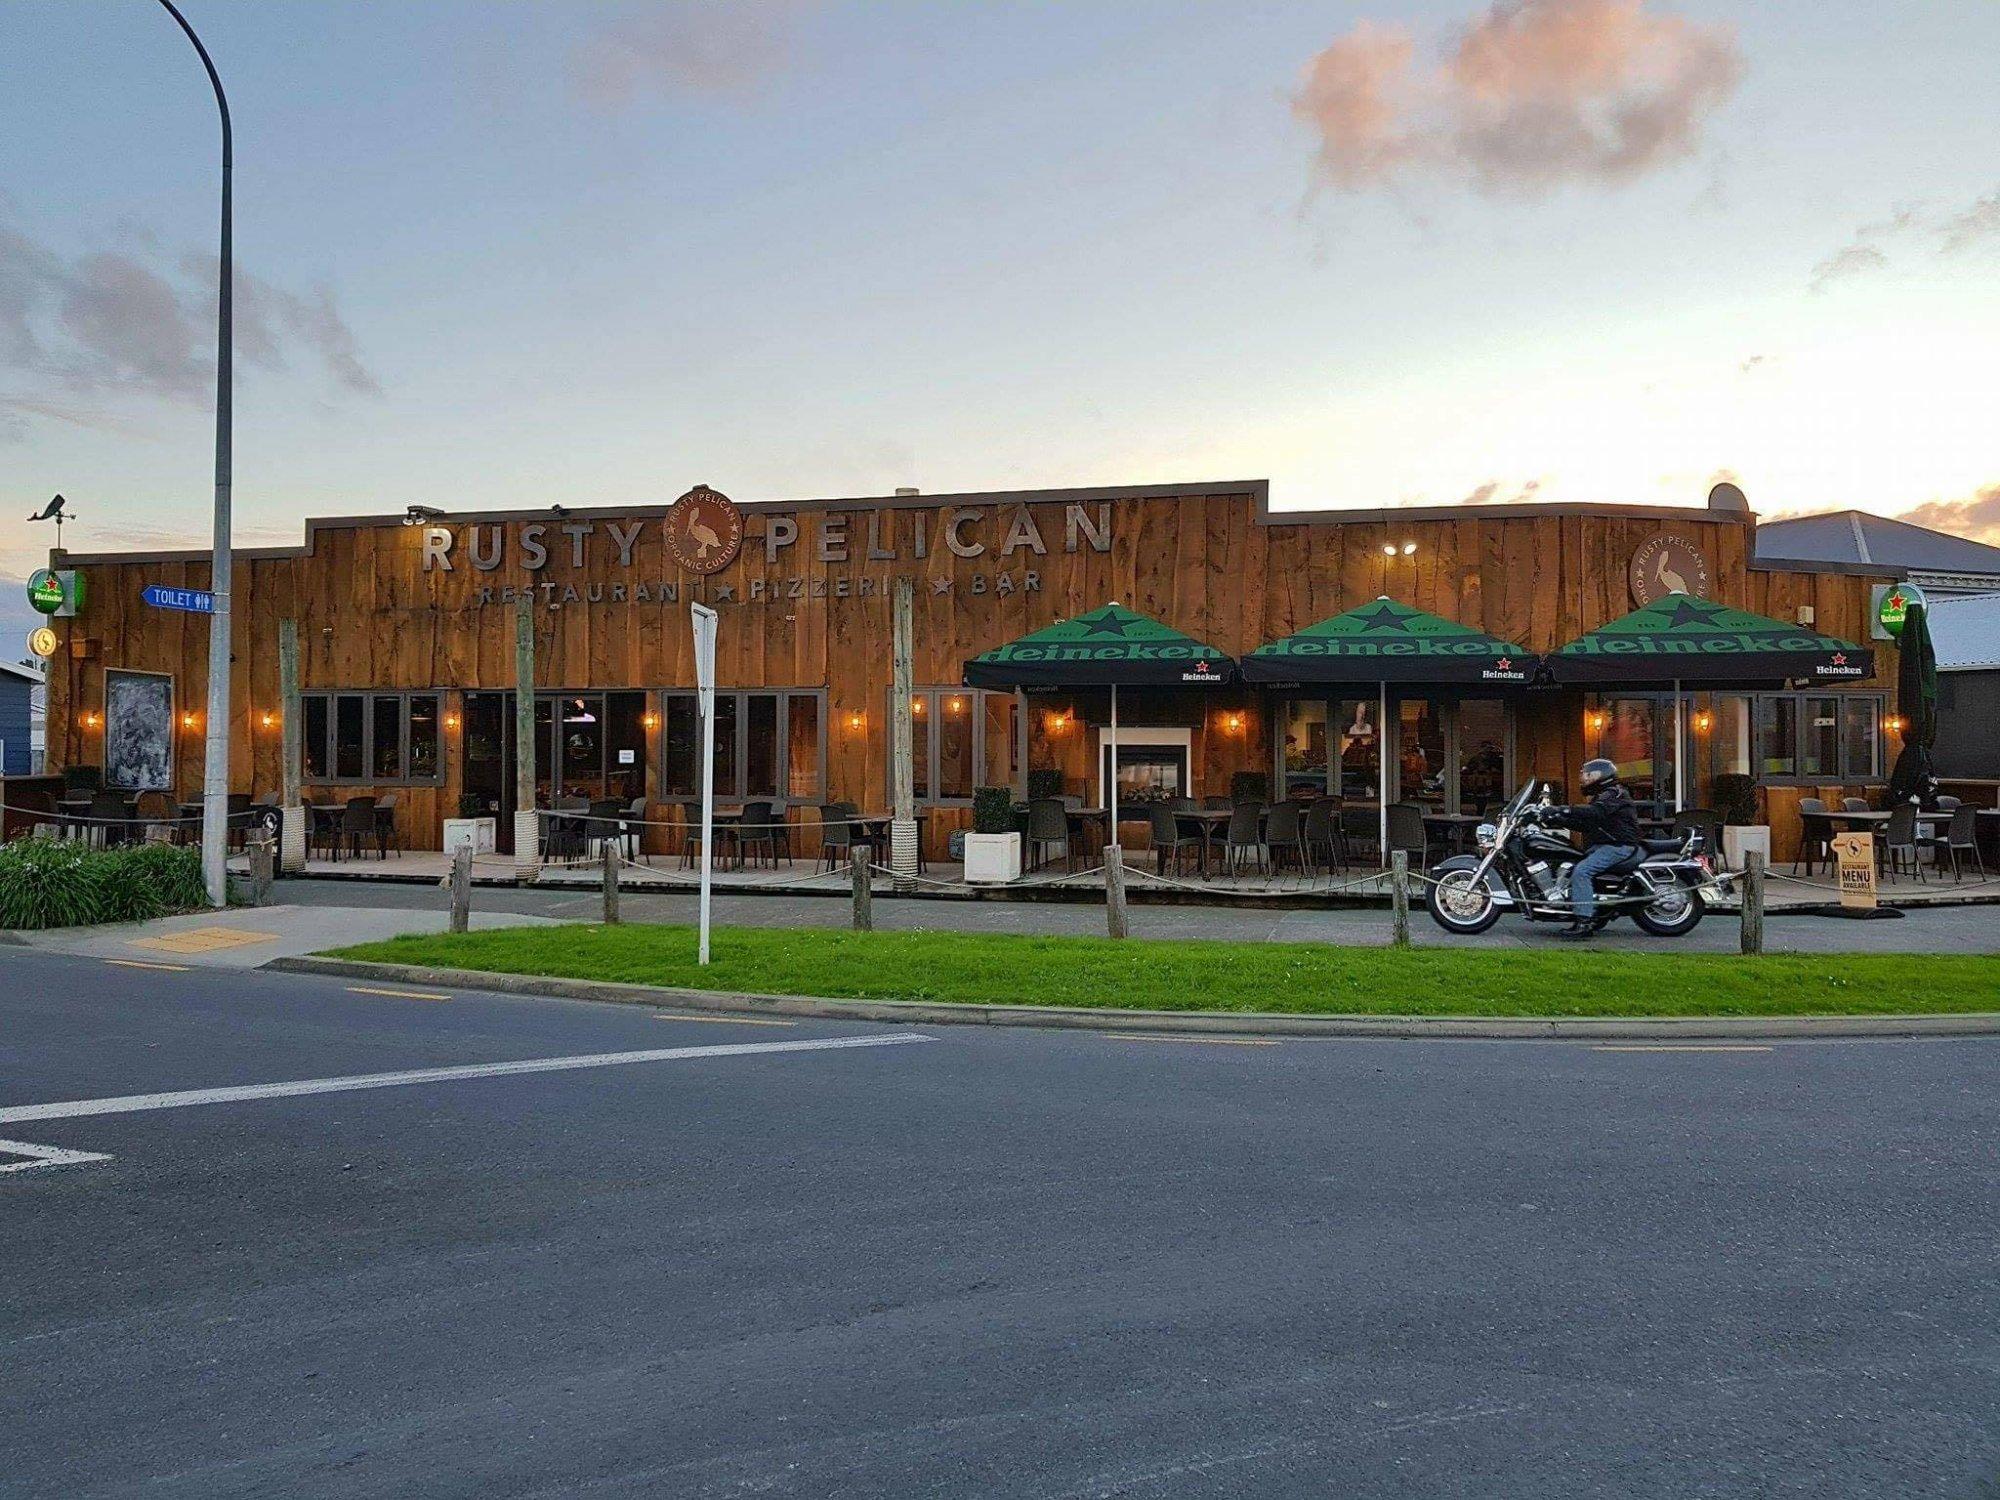 Rusty Pelican Restaurant & Pizzeria